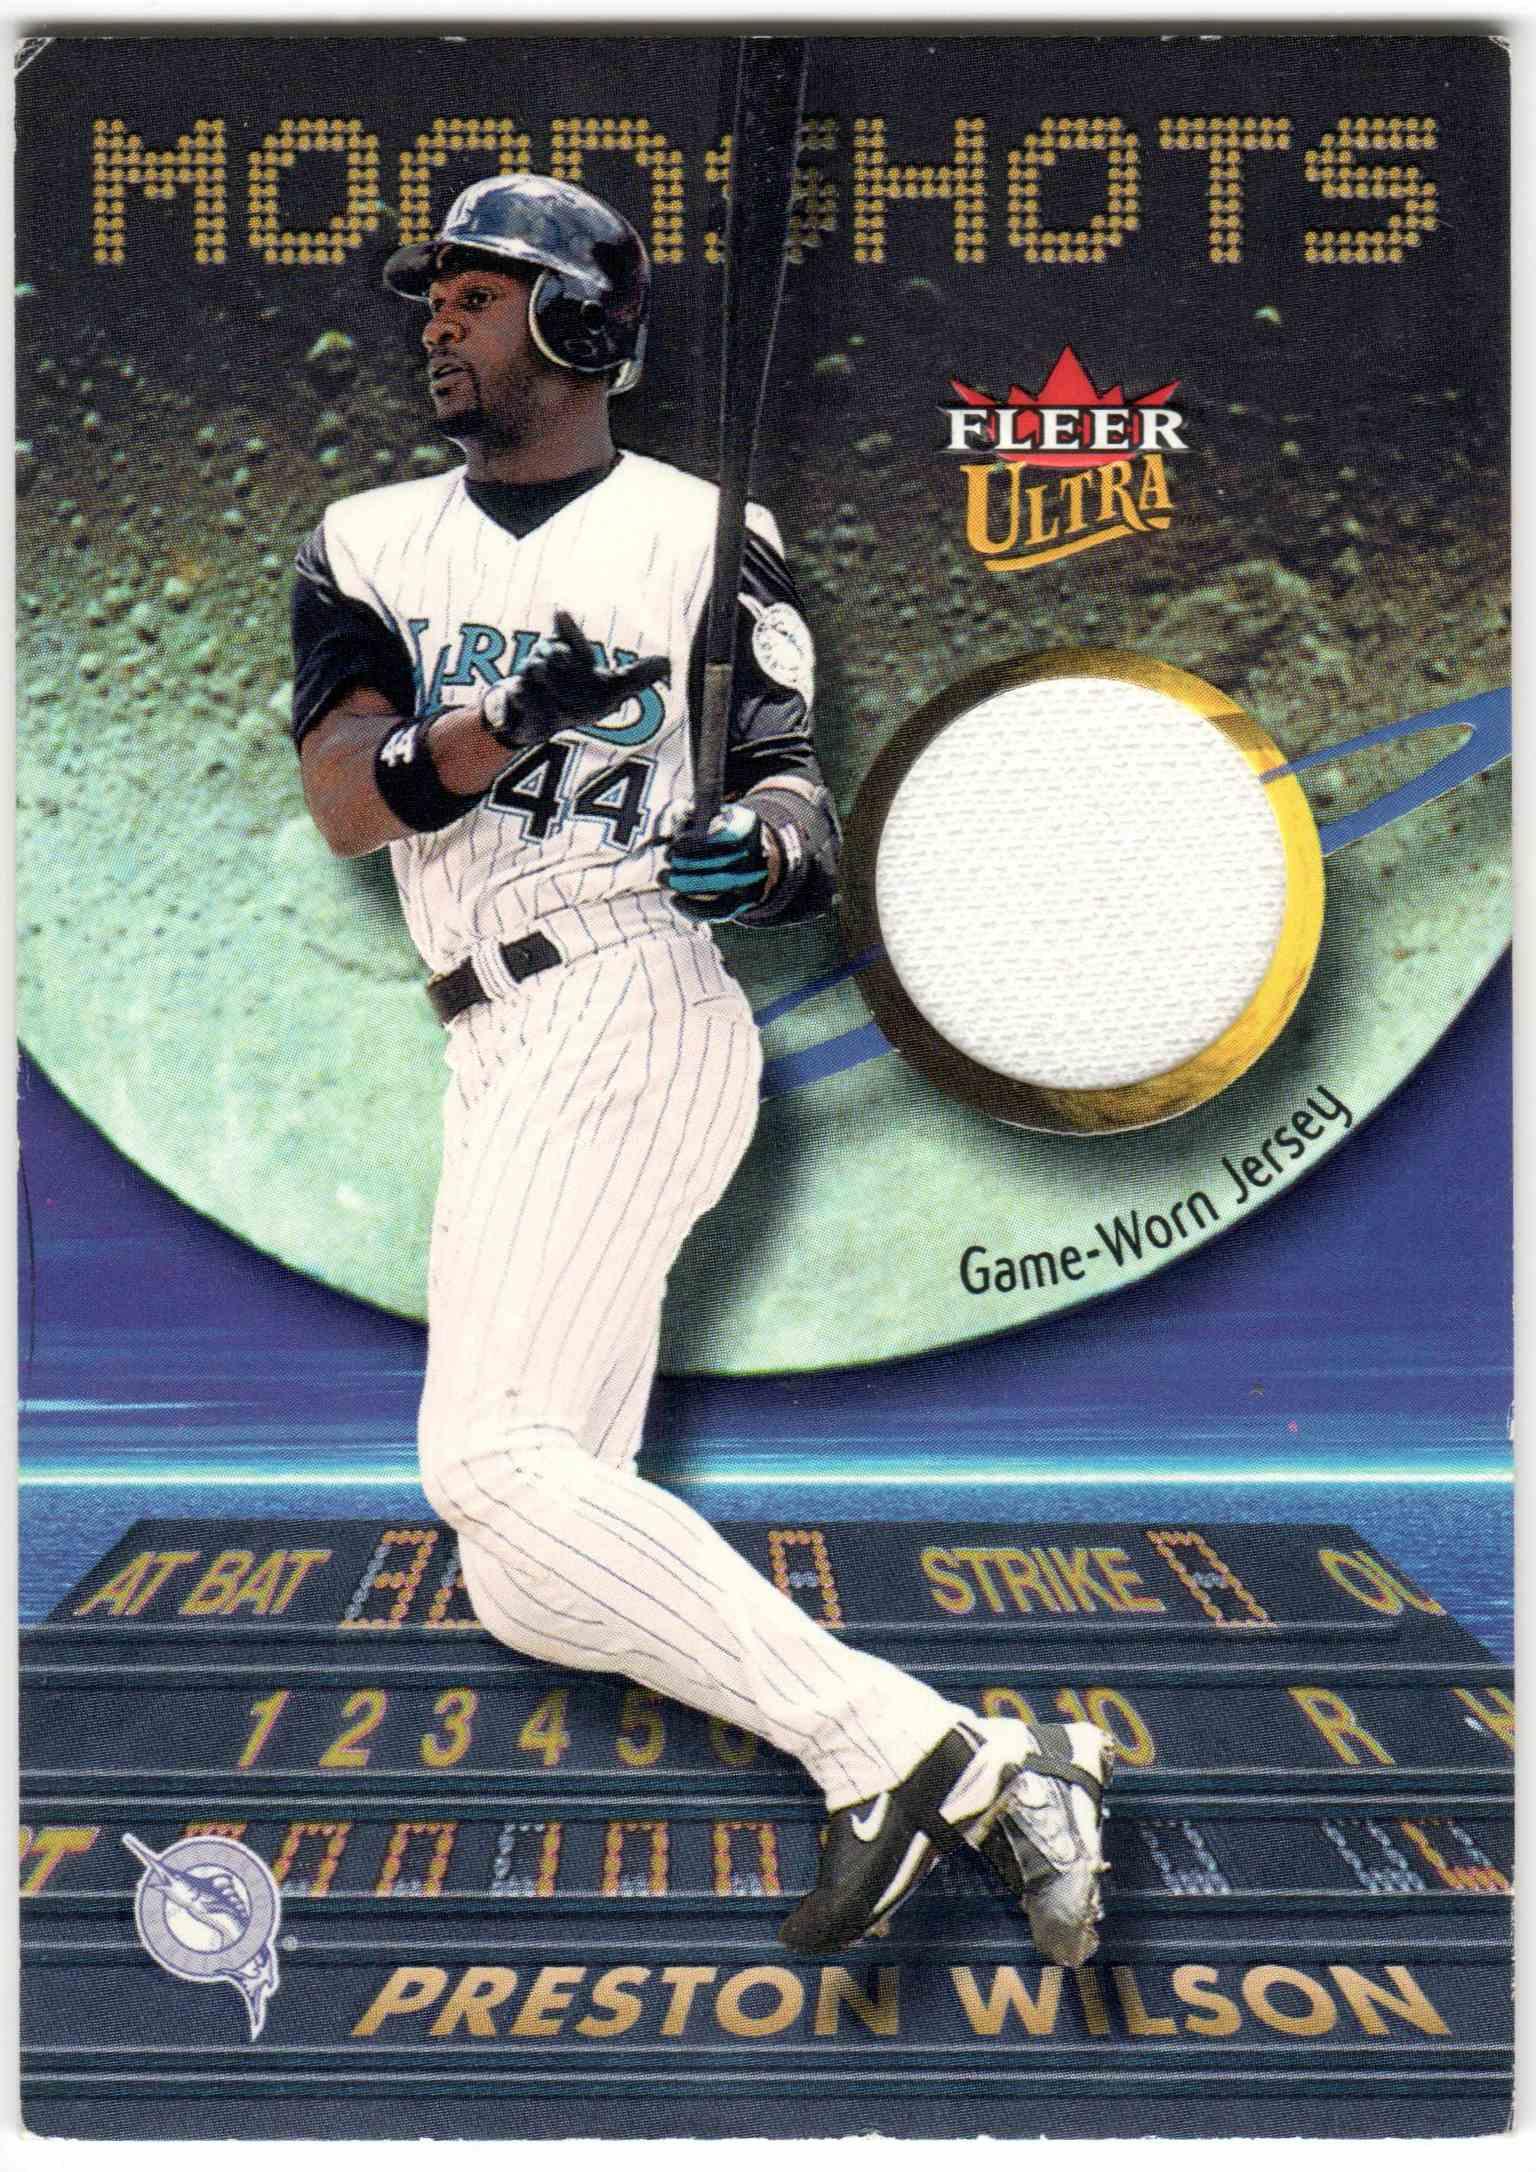 2003 Fleer Ultra Preston Wilson card front image